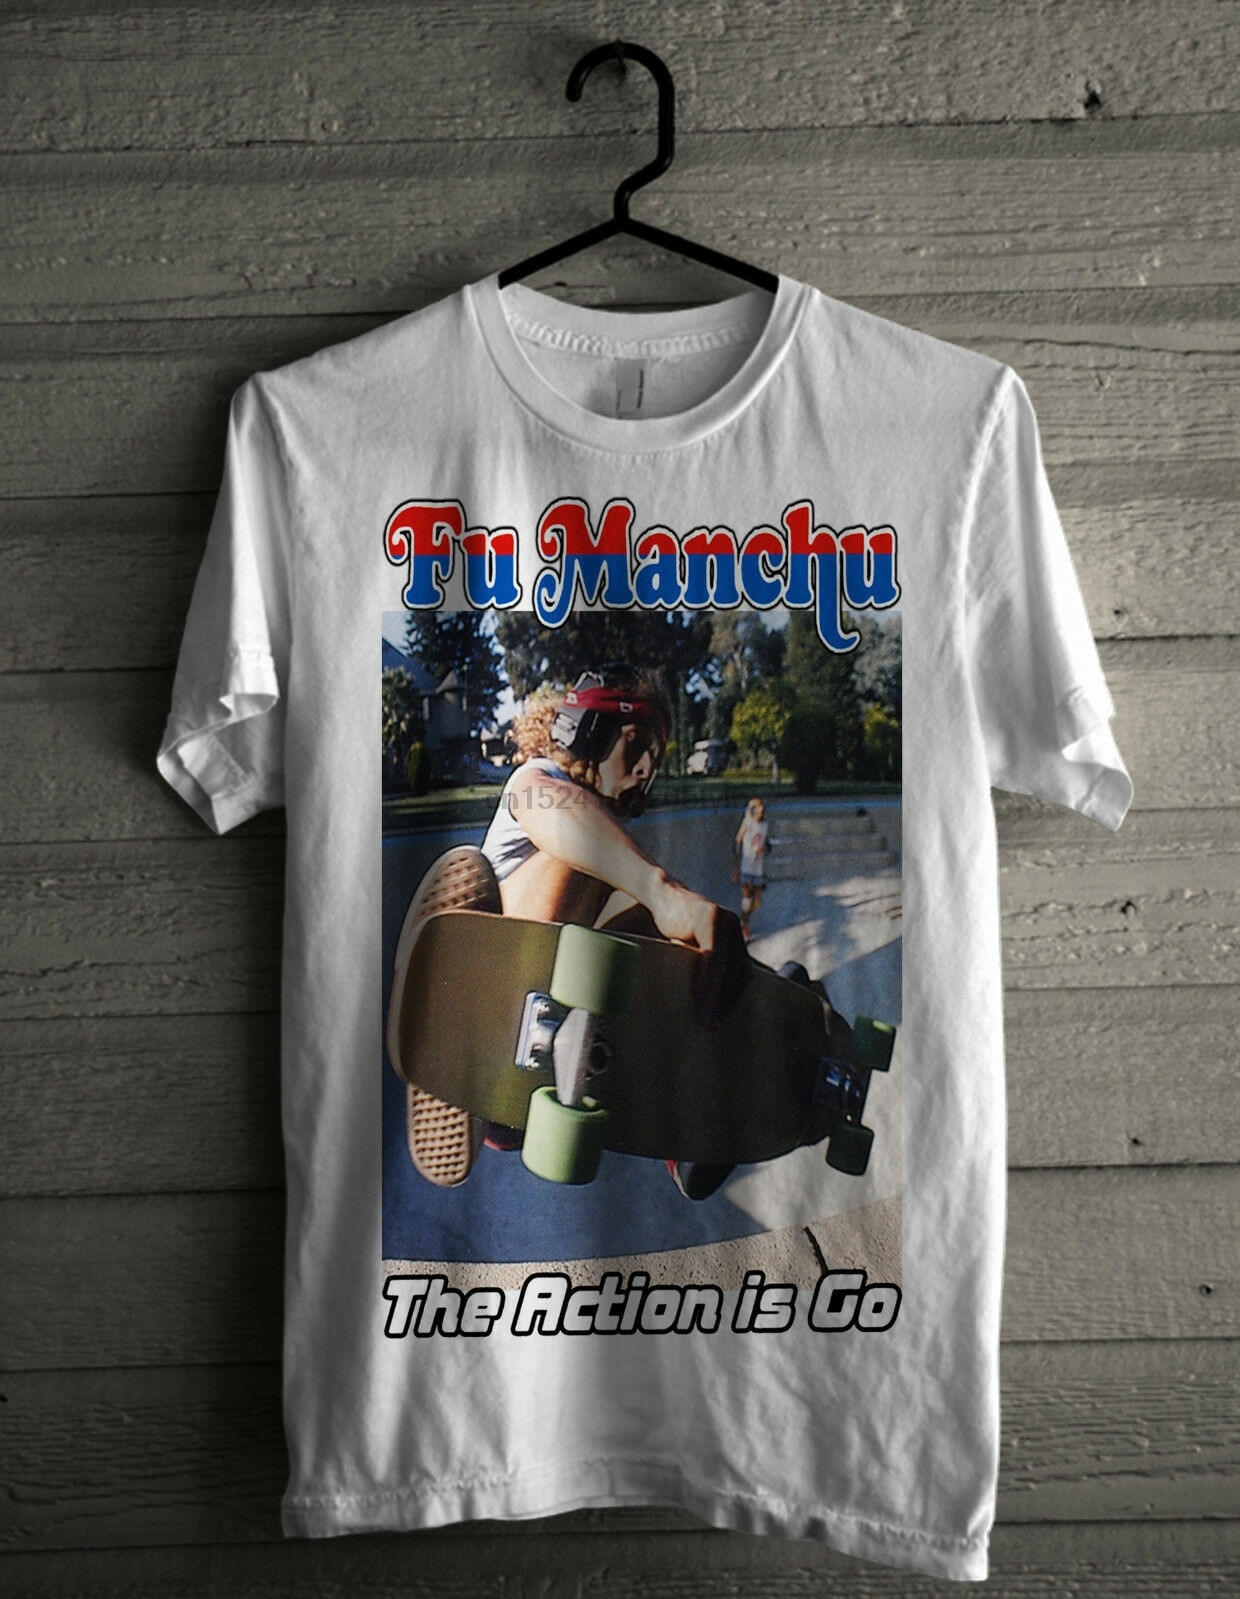 FU MANCHU футболка Stoner KYUSS сцепление коррозии соответствия вниз зубчатый сон